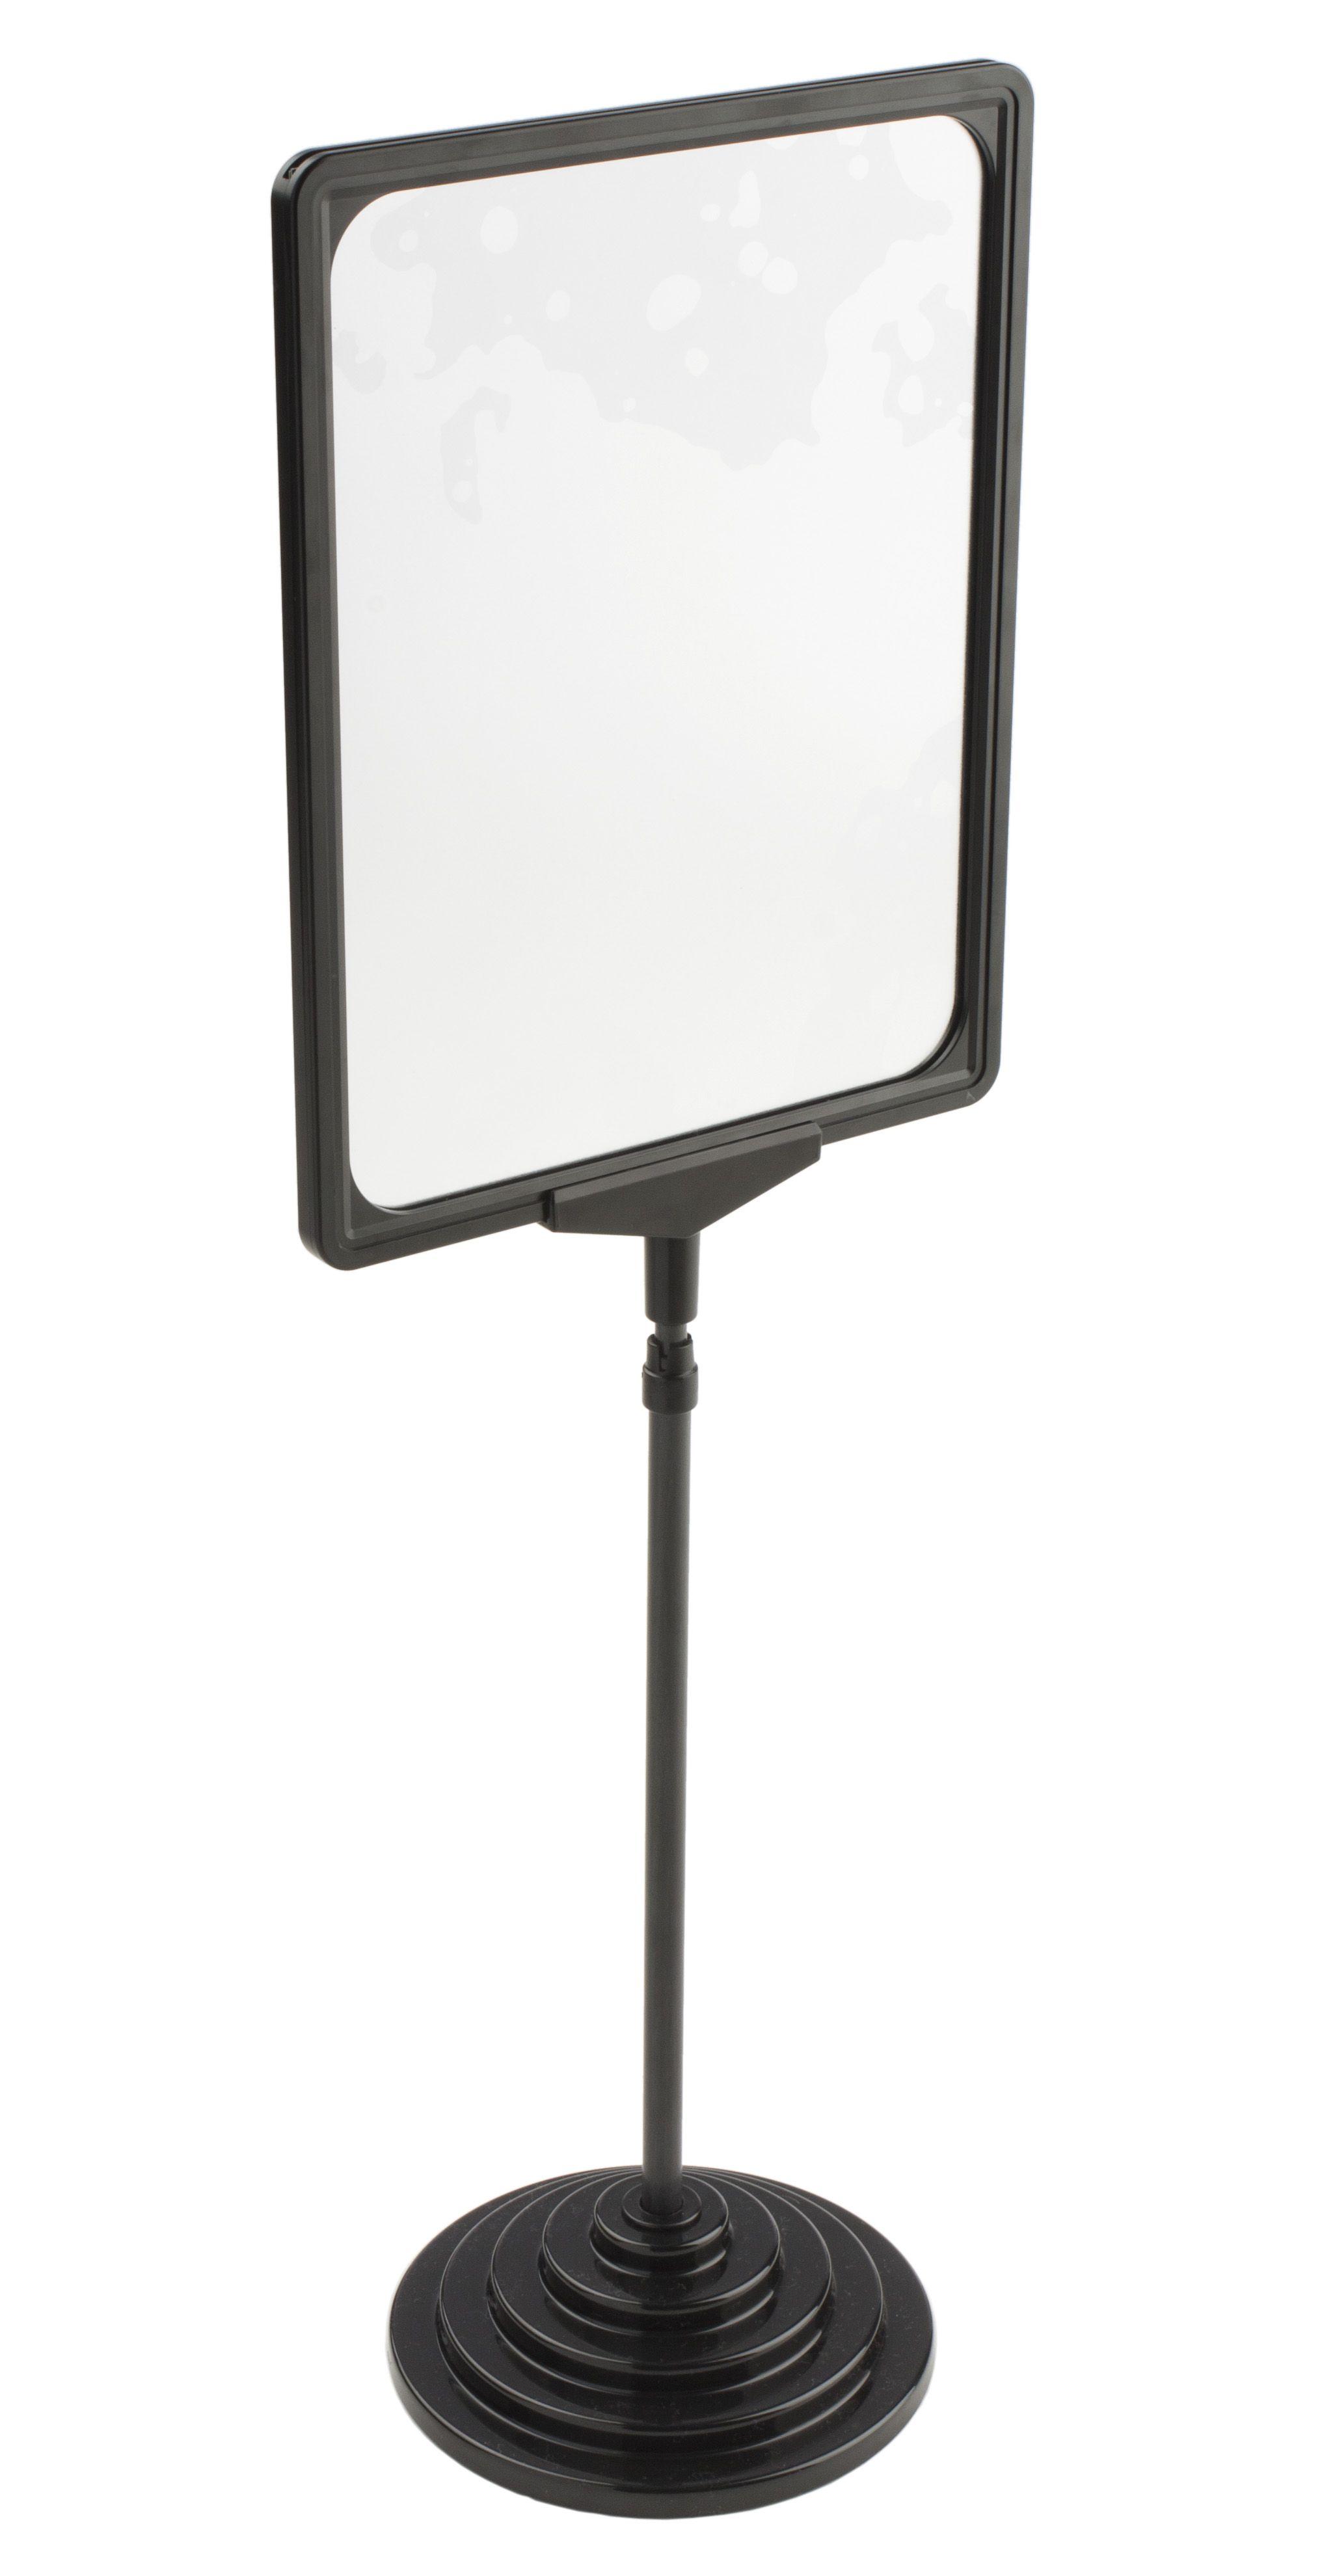 8 5 X 11 Sign Holder For Counter Floor Adjustable 2 Insert